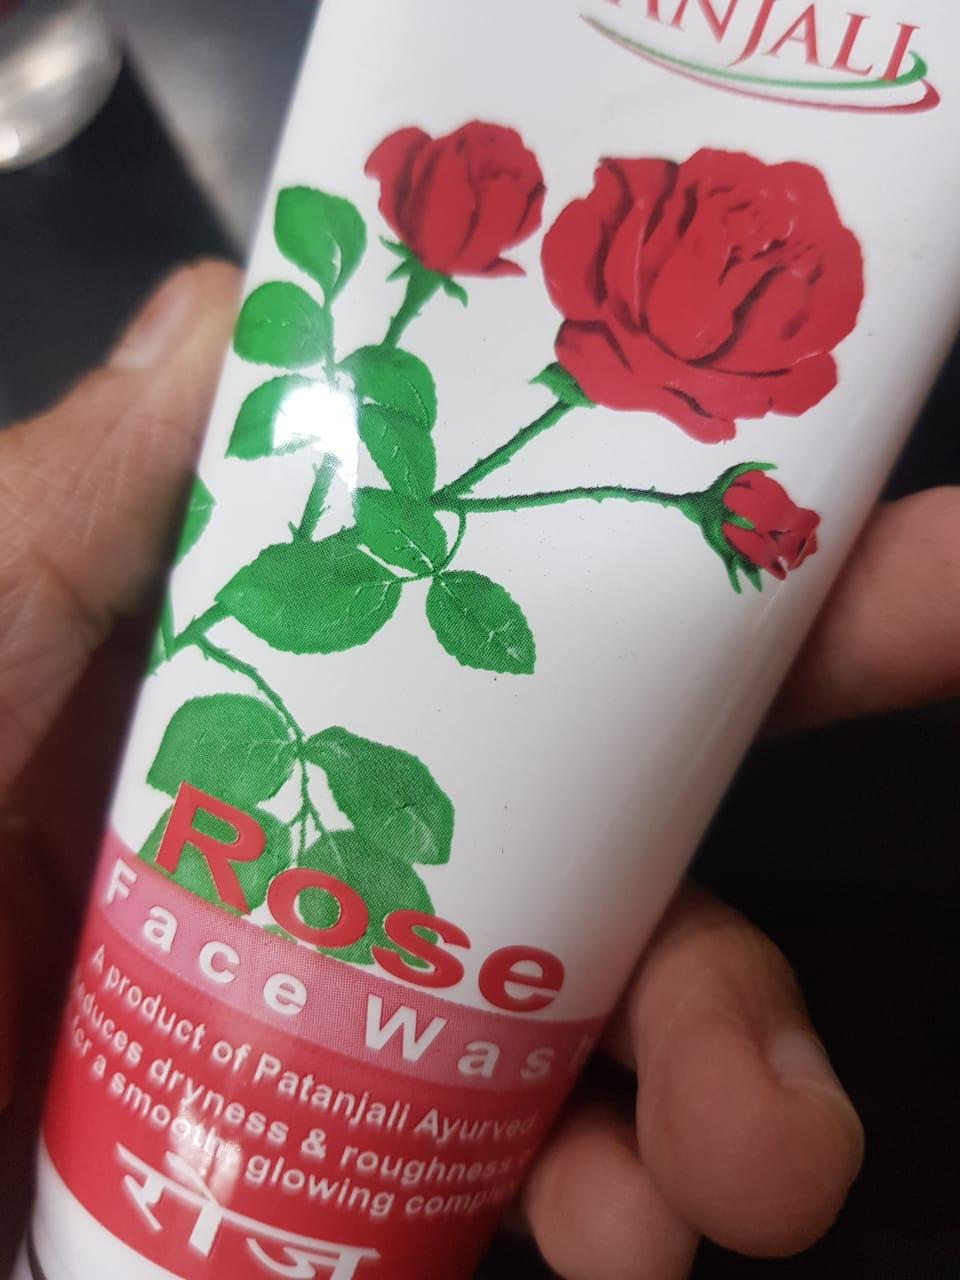 Patanjali Rose Face Wash-Rose face wash-By poonam_kakkar